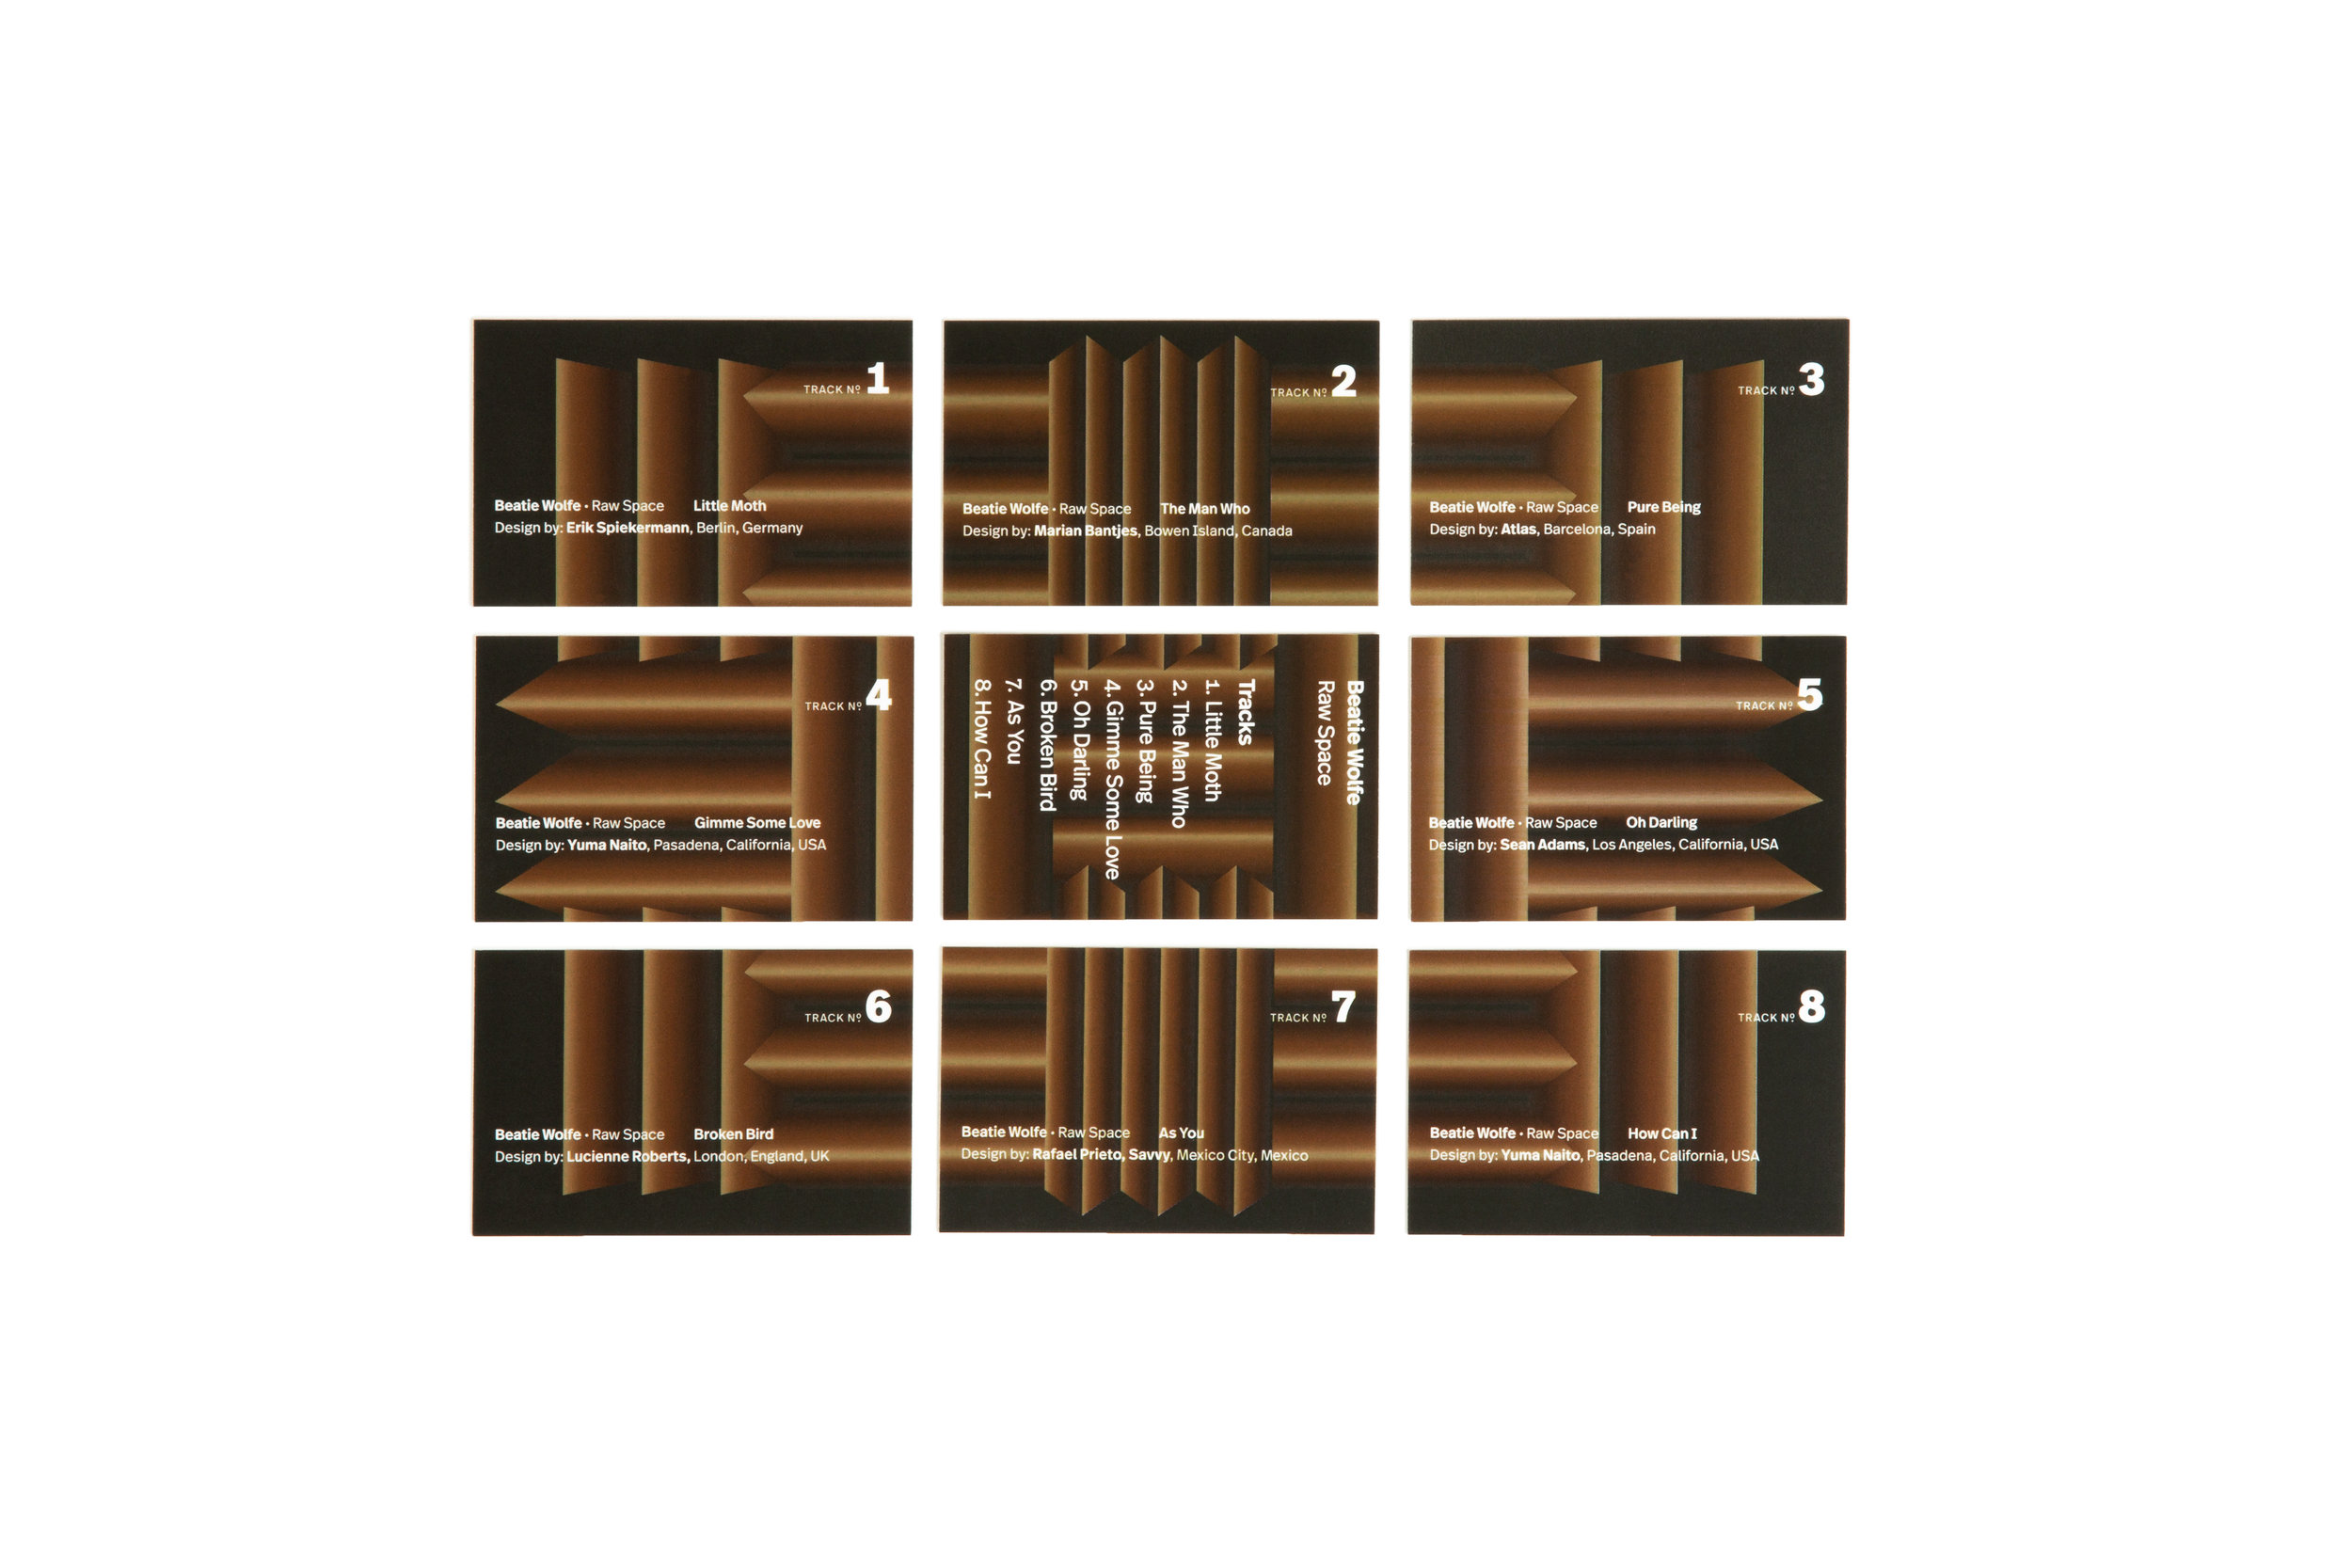 0.Beatie Wolfe's Raw Space Album Deck of cards - reverse.jpg